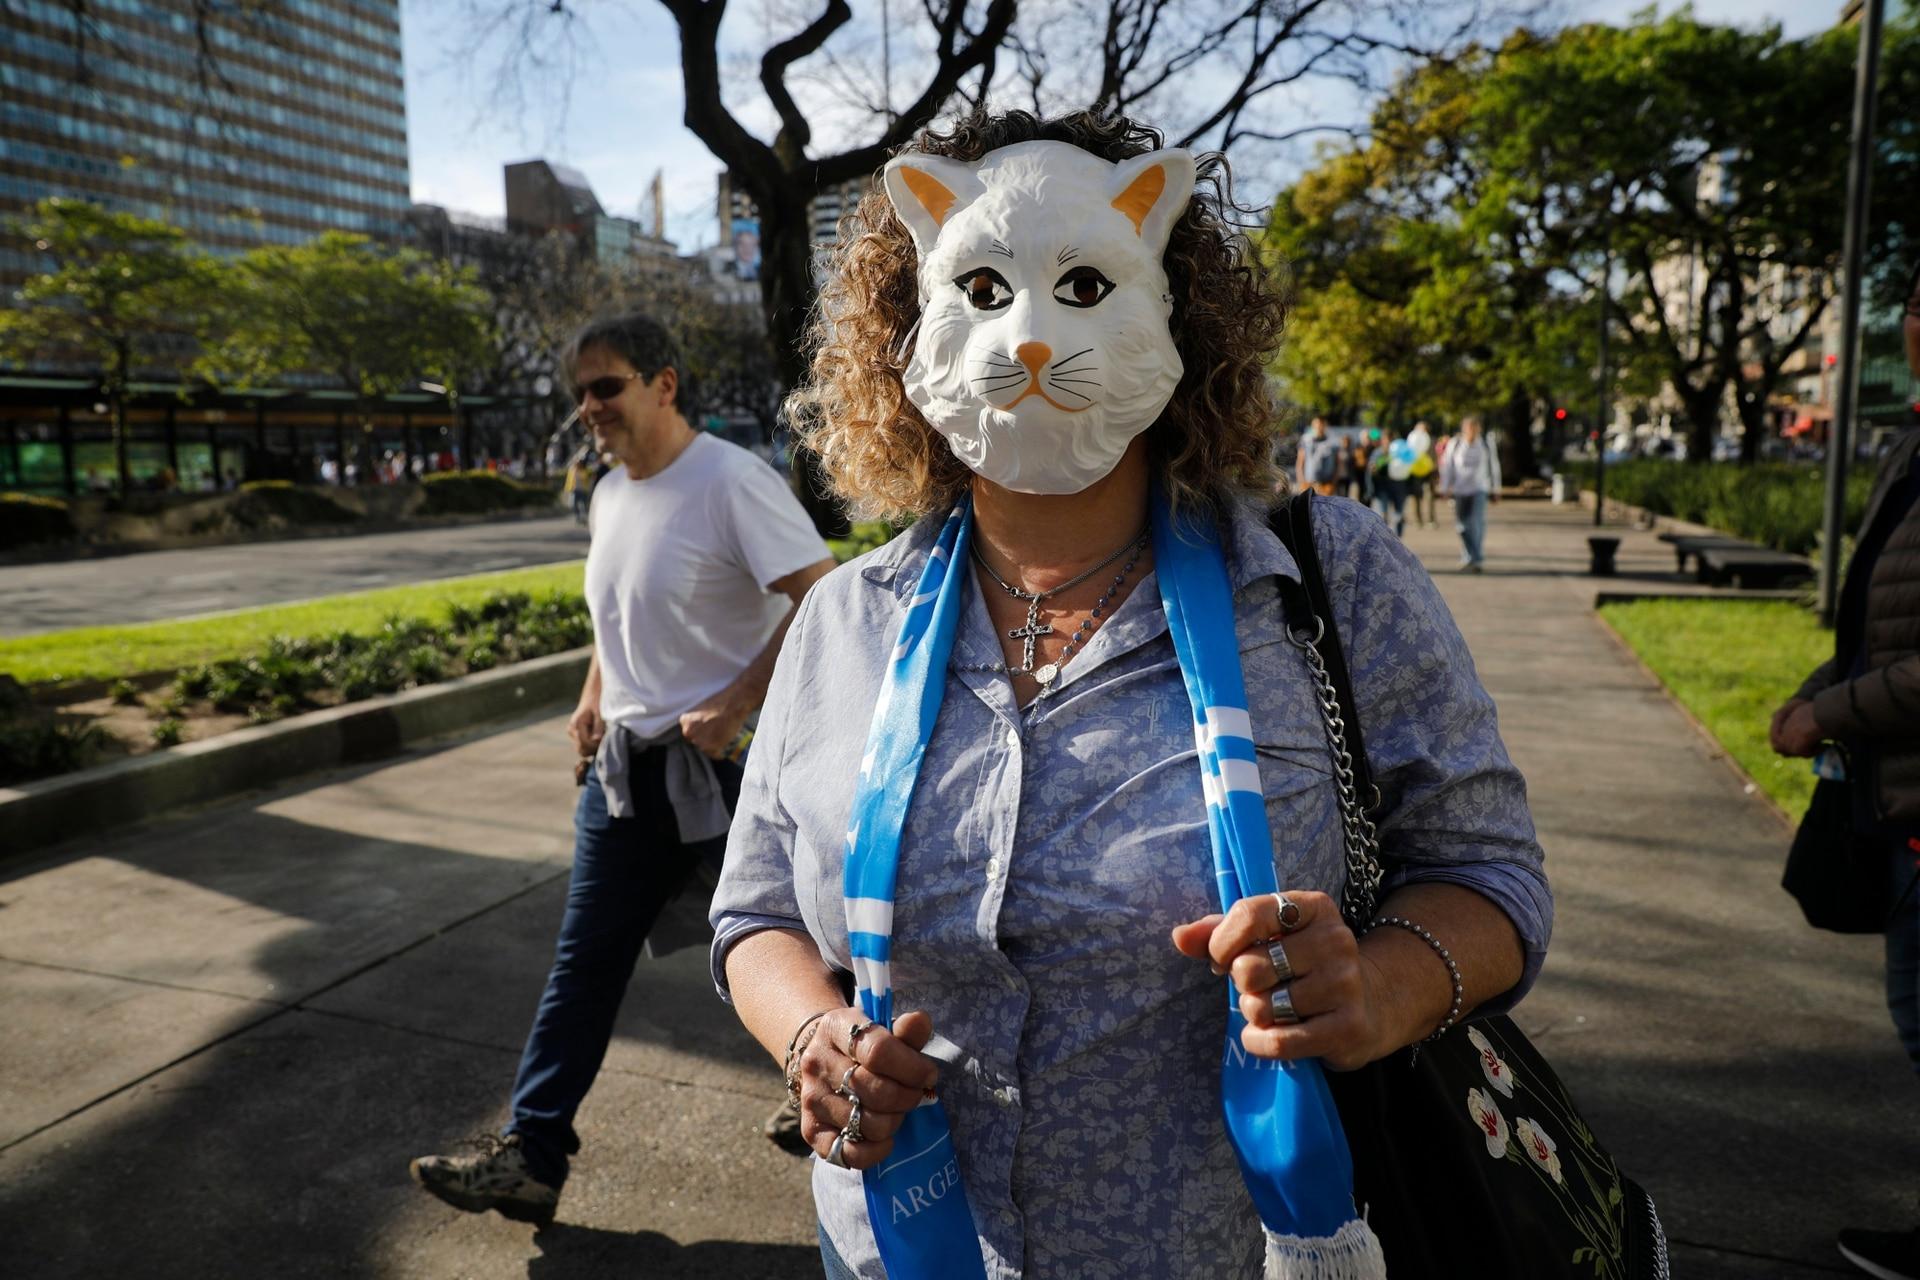 Algunos asistentes optaron por máscaras